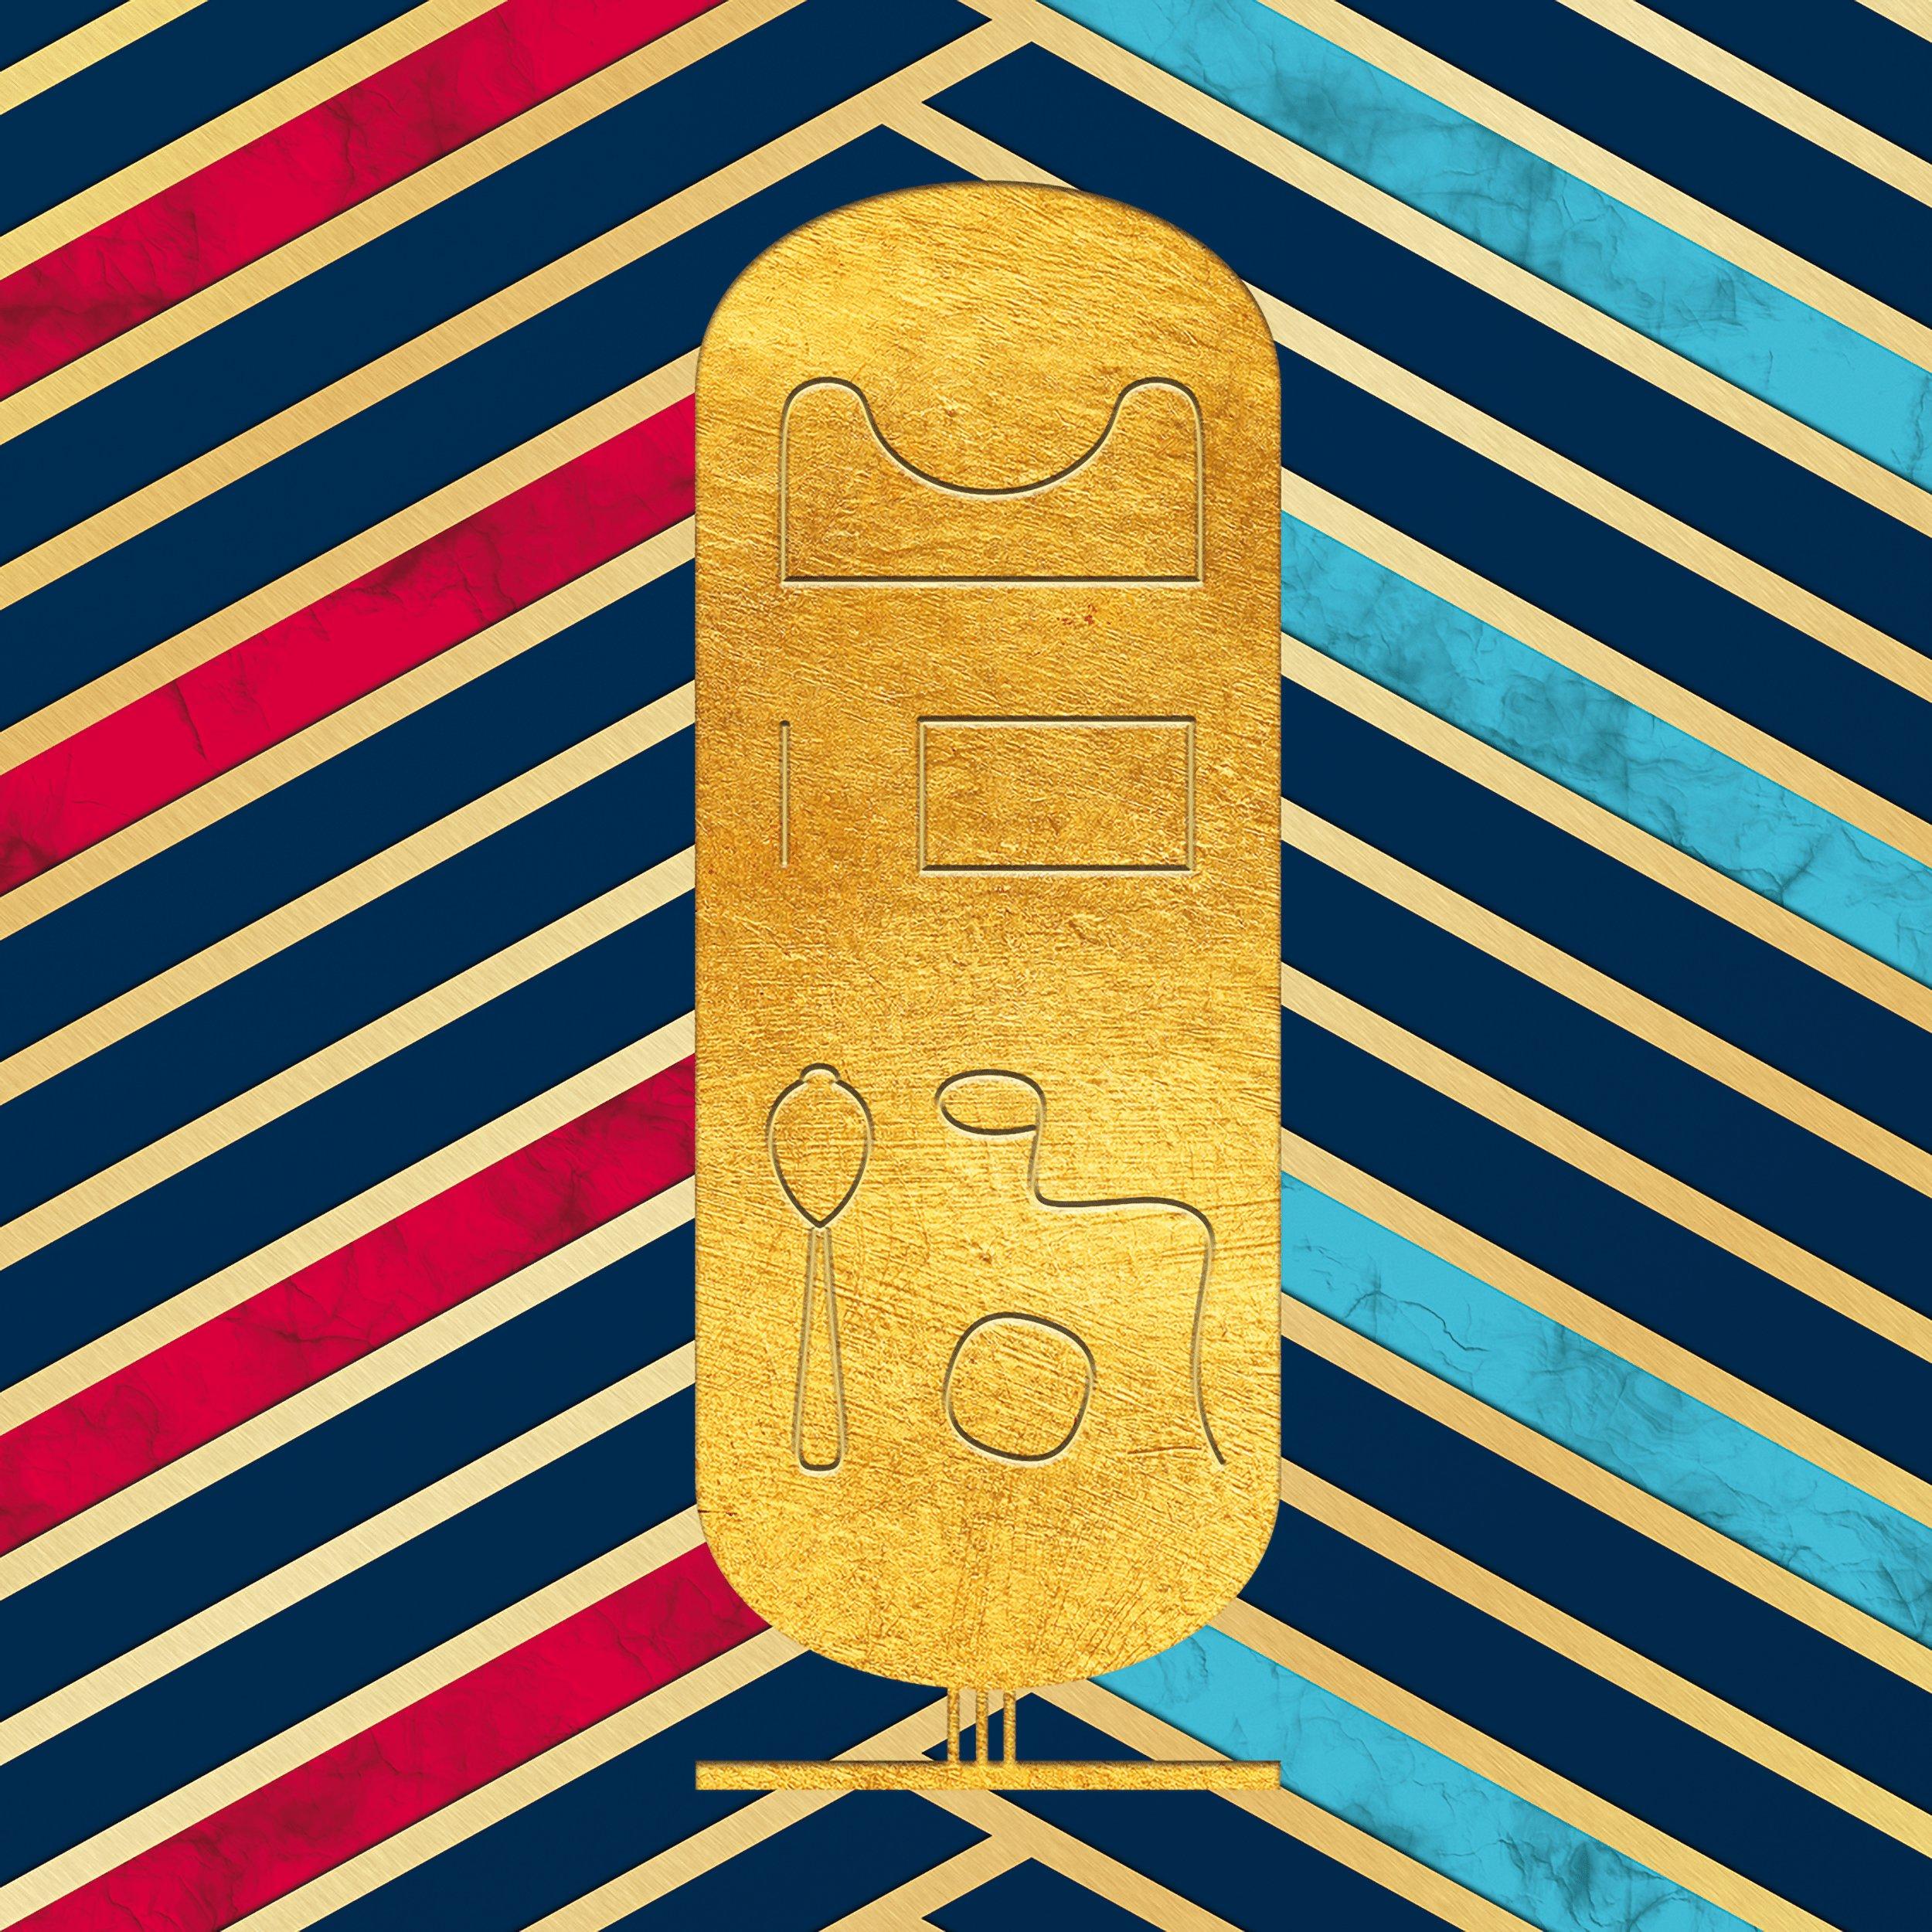 Carnet #146 Montblanc Heritage Egyptomania, Montblanc